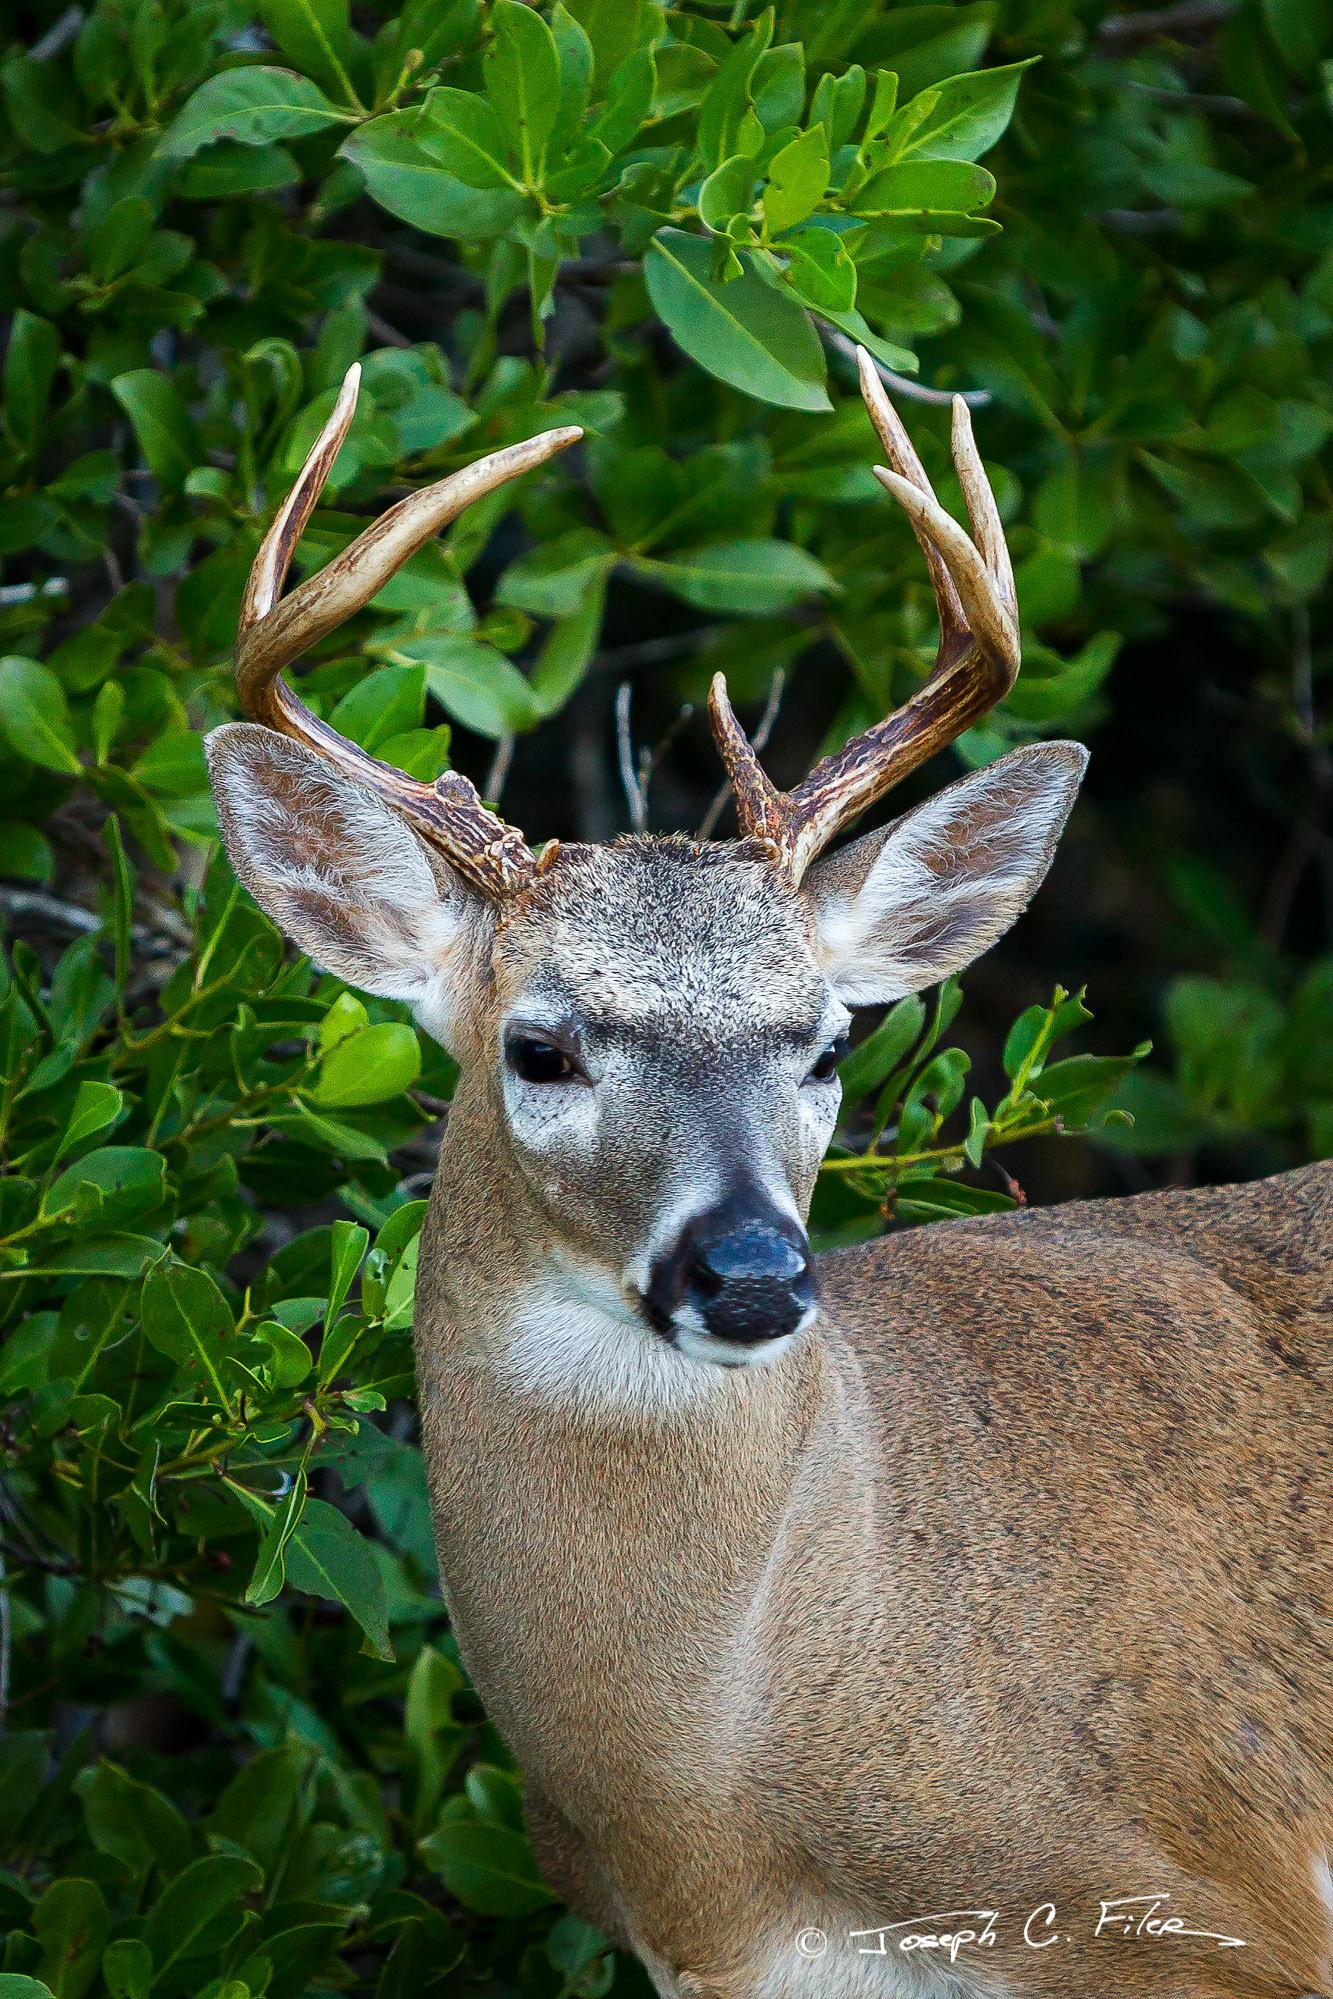 Deer, Key Deer, Florida, Big Pine Key, limited edition, photograph, fine art, wildlife, photo